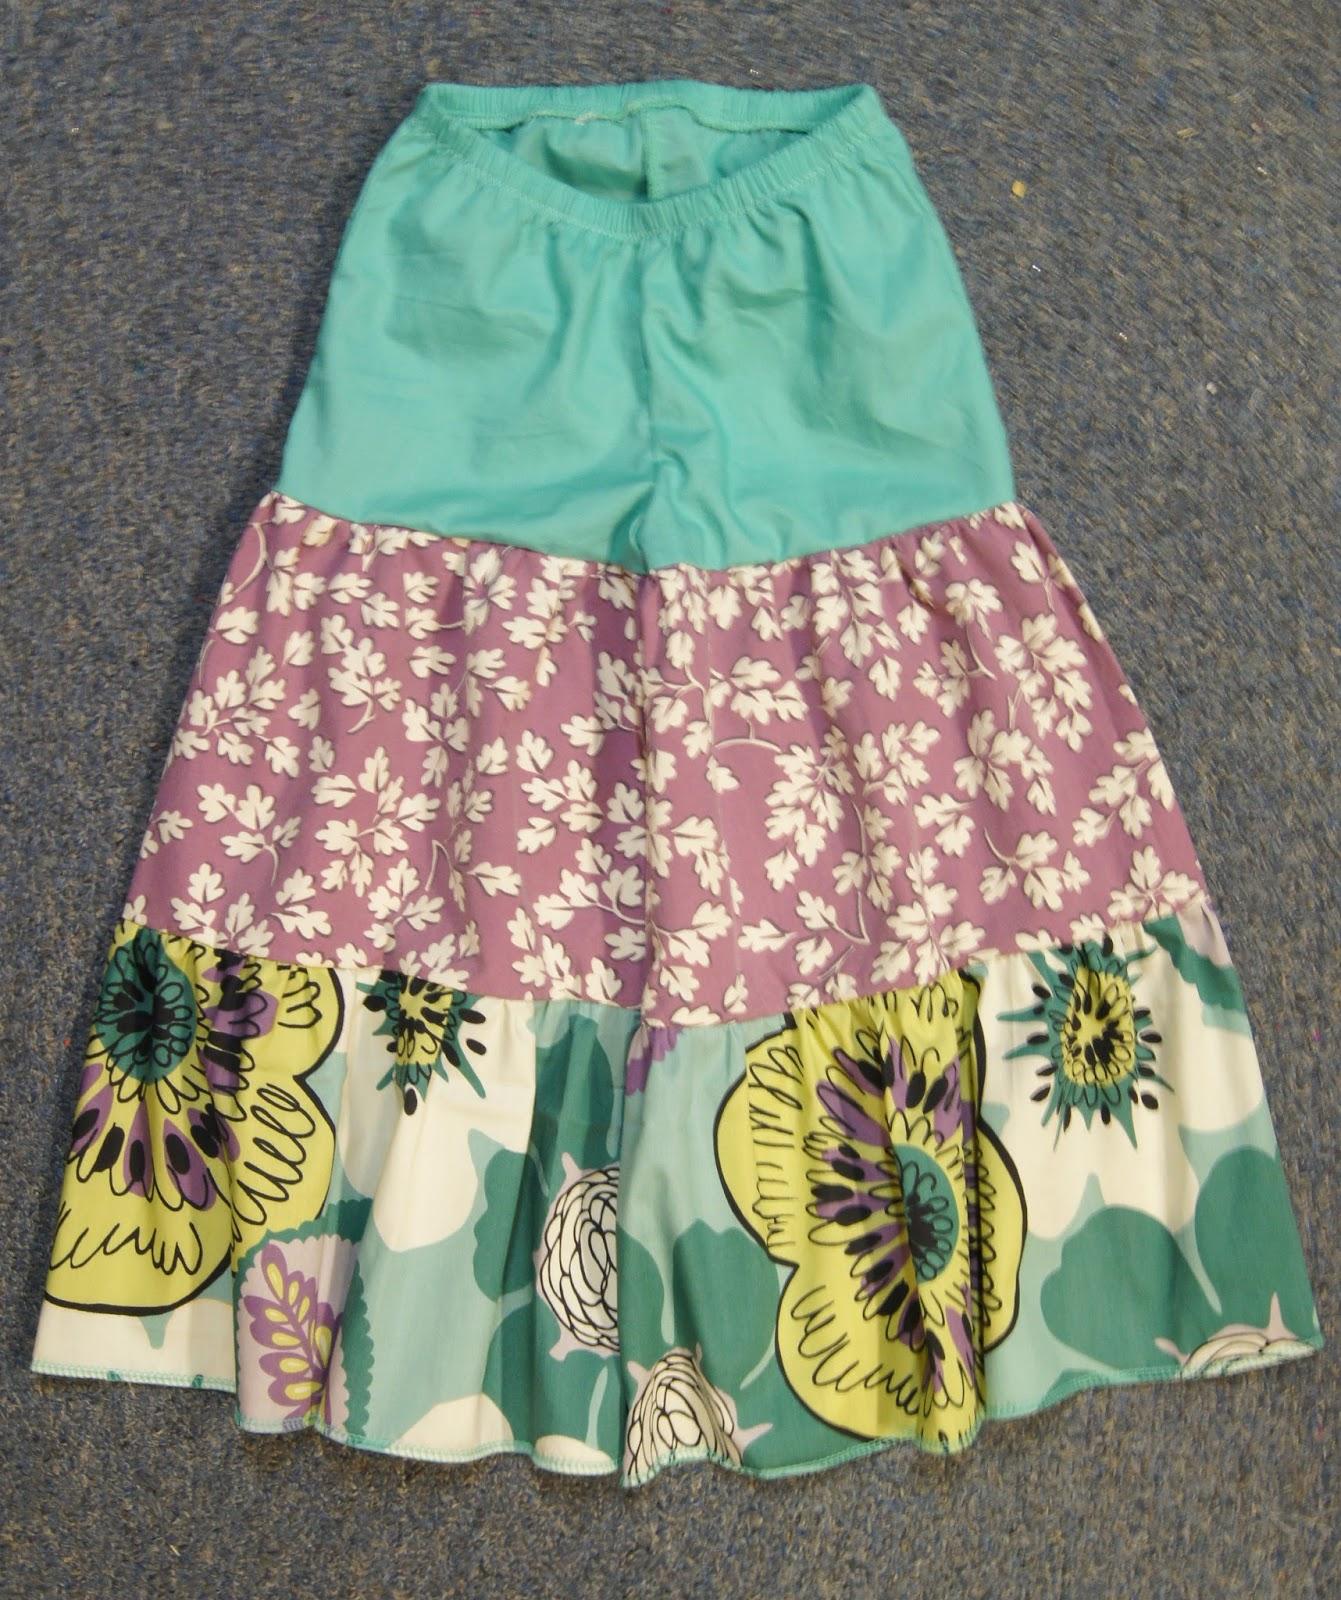 Maxi Skirt Pants That Look Like